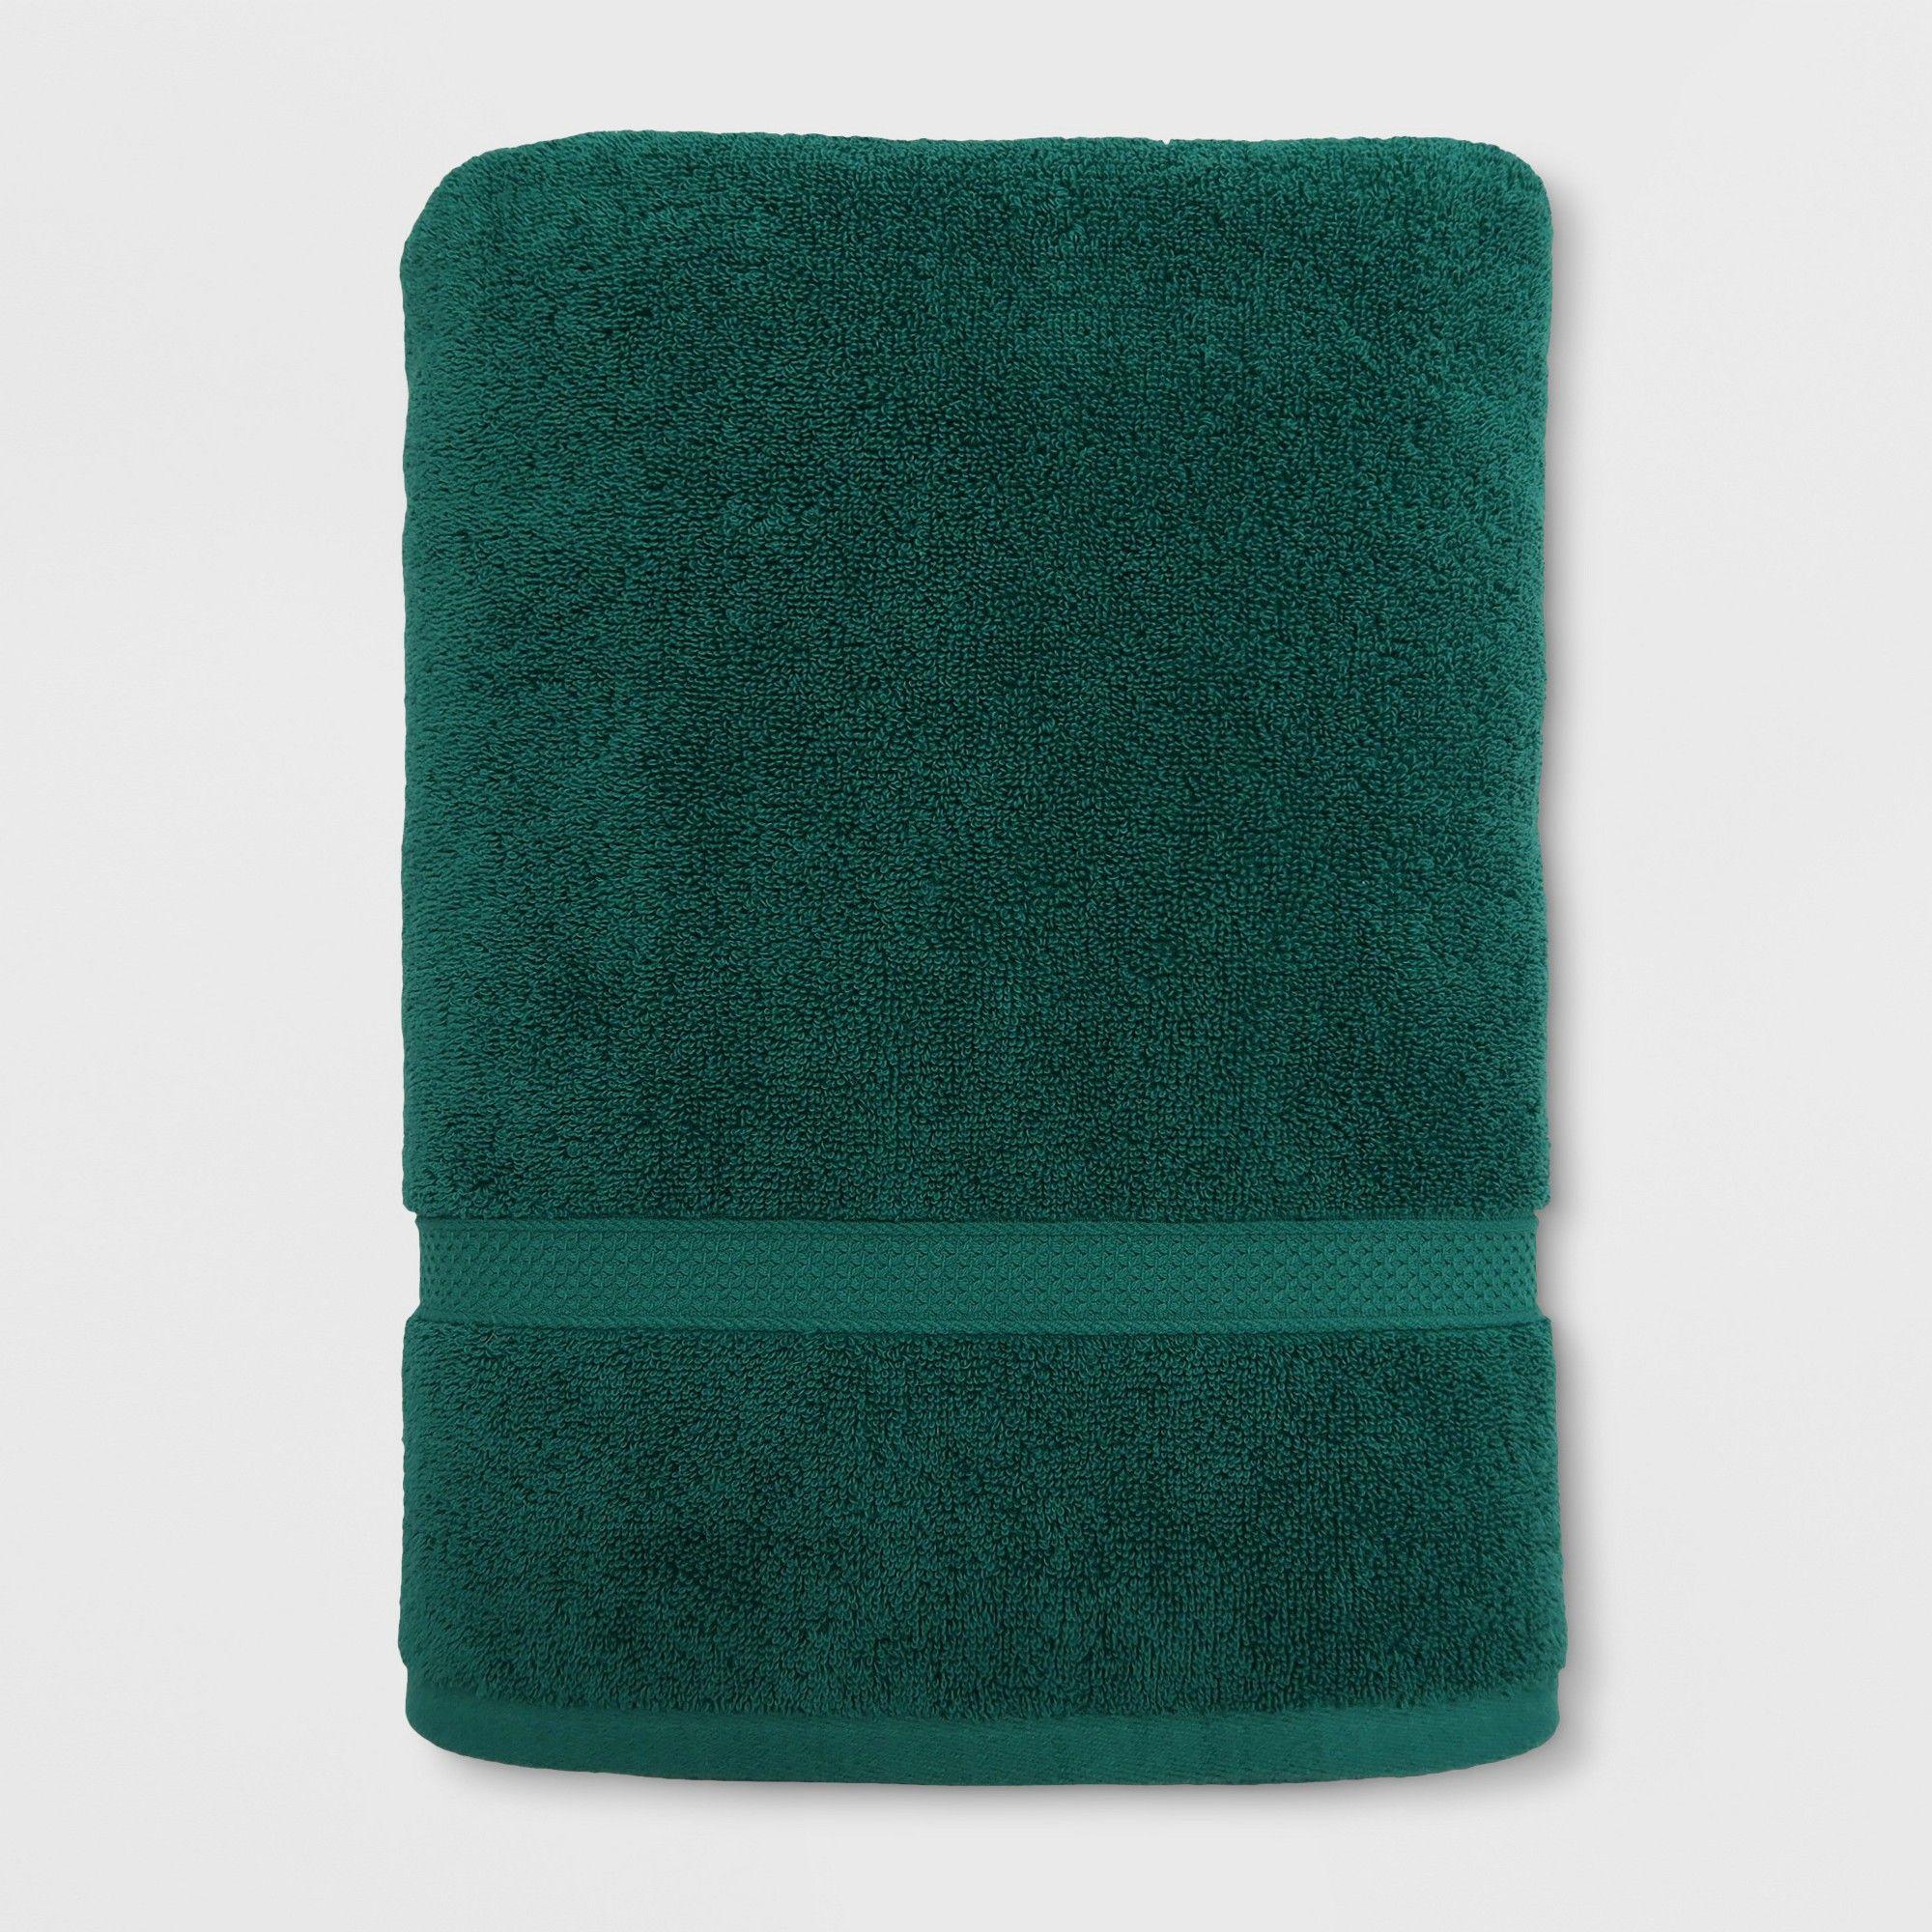 Soft Solid Bath Sheet Bluff Green Opalhouse Adult Unisex In